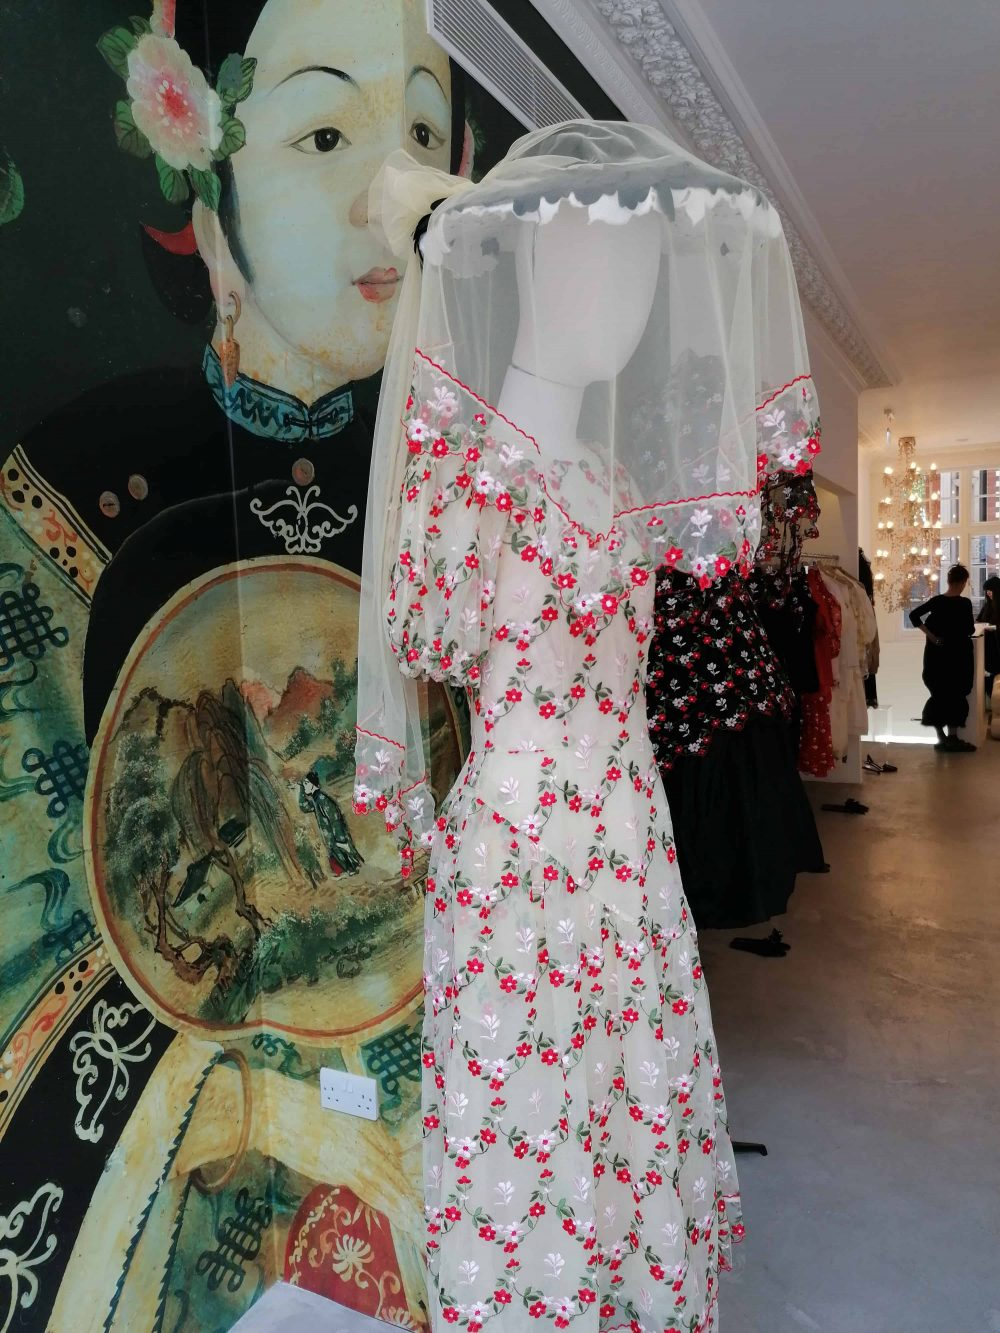 dress by fashion designer Simone Rocha, shop on Mount Street, Mayfair, Latest in Design Tour, Fashion Tours London